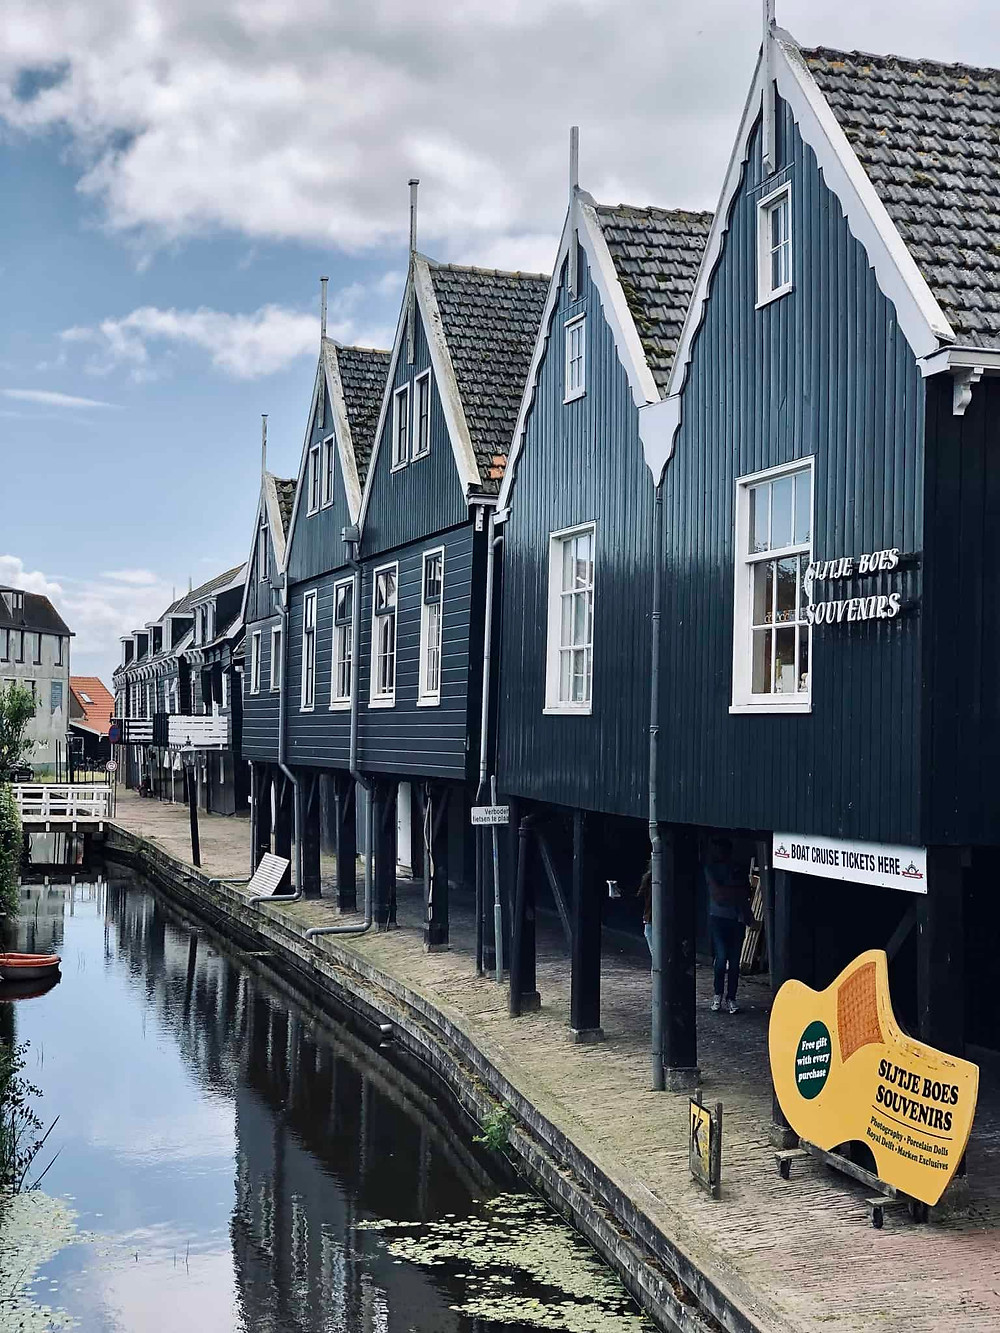 Marken The Netherlands